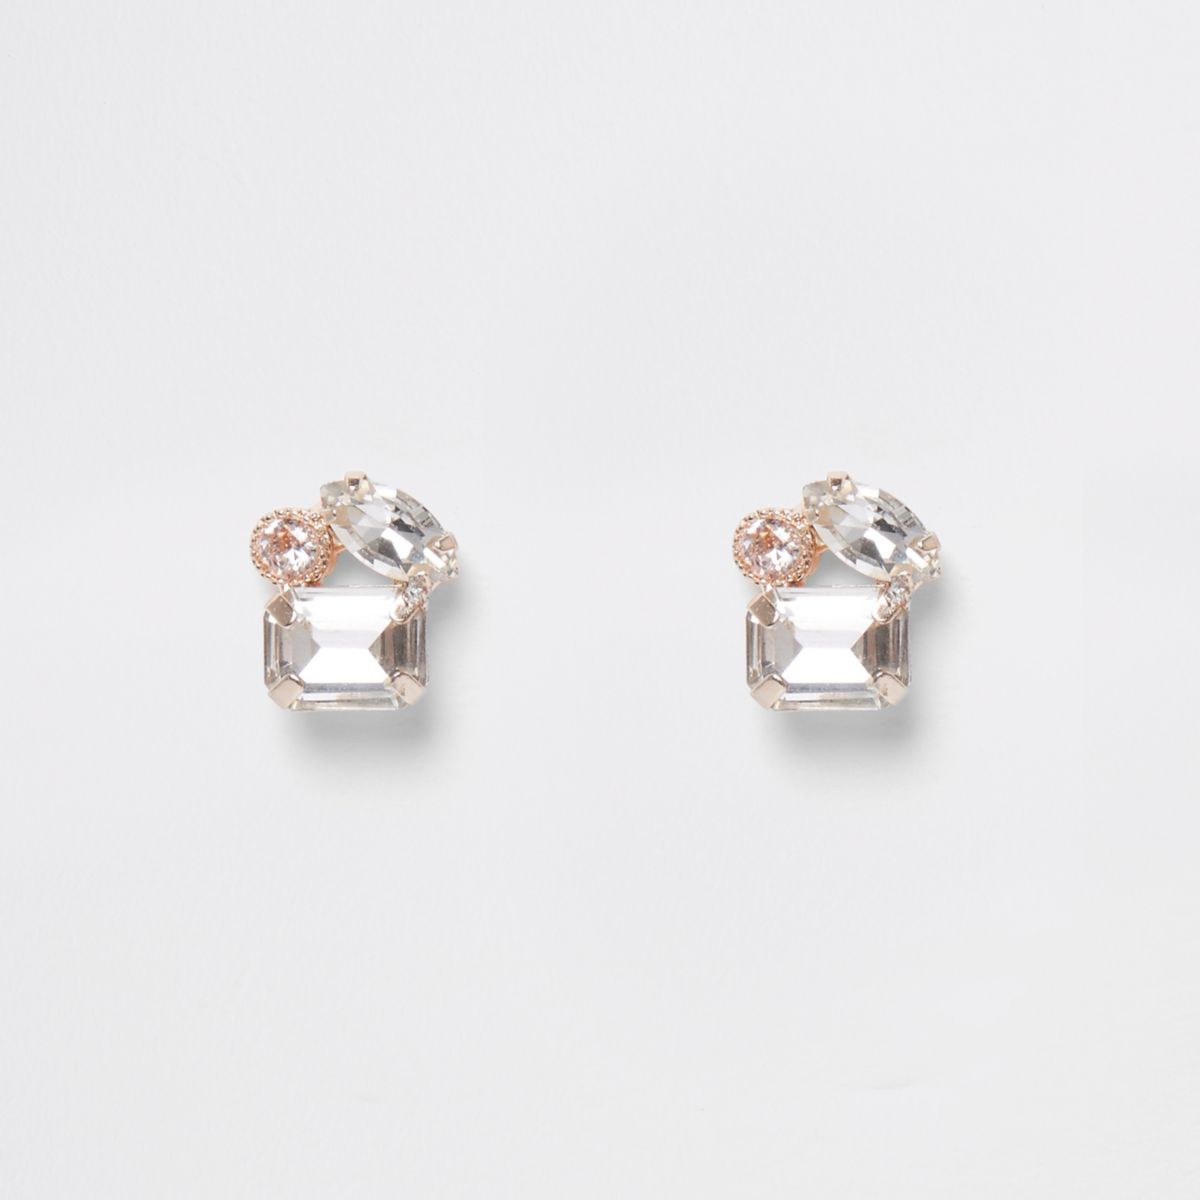 Rose gold tone three stone stud earrings